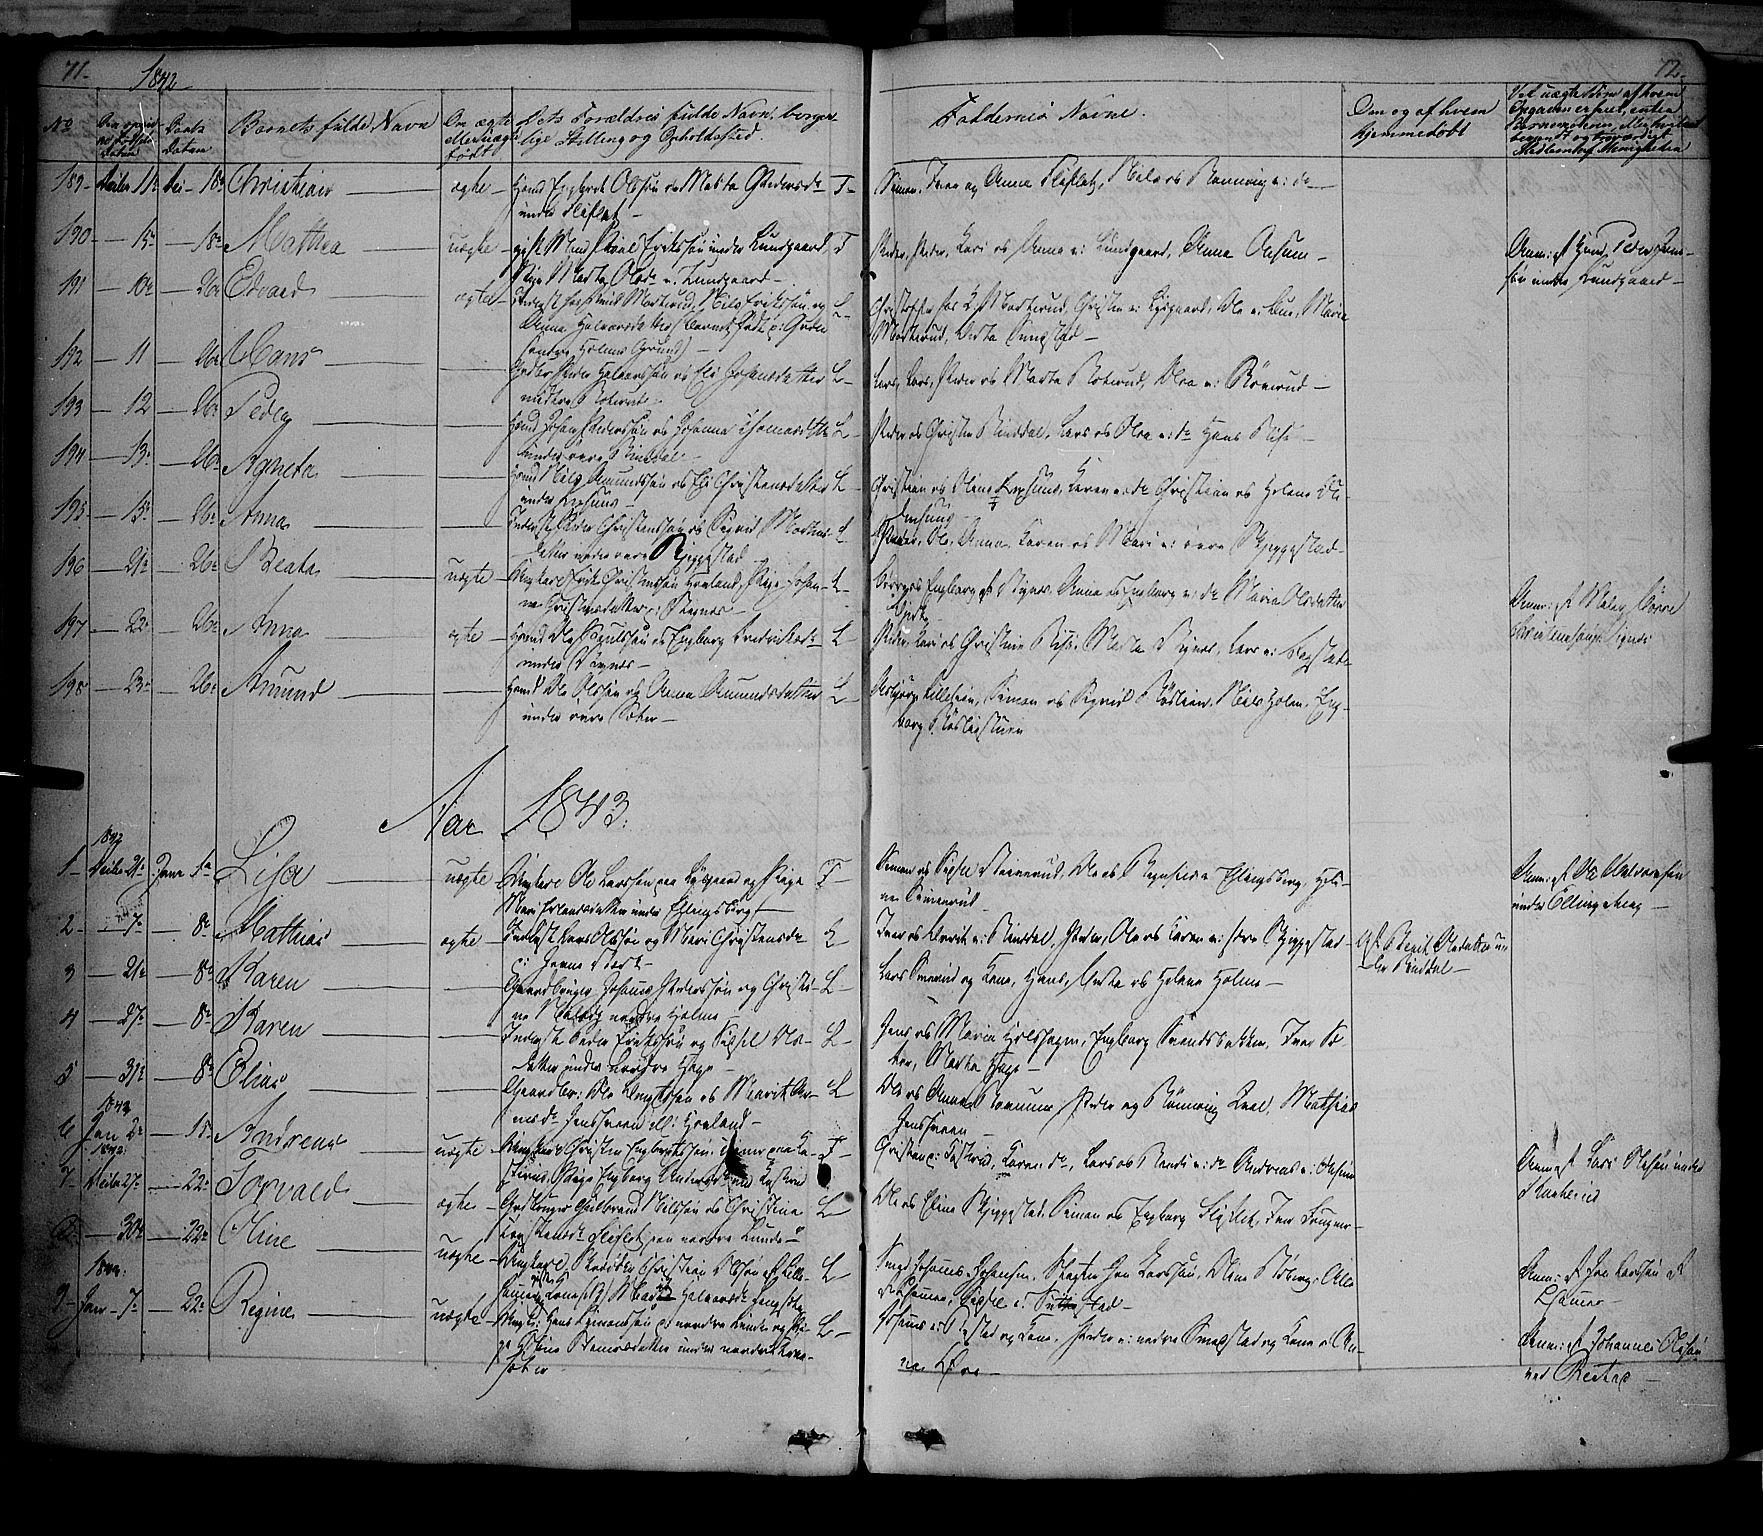 SAH, Fåberg prestekontor, Ministerialbok nr. 5, 1836-1854, s. 71-72